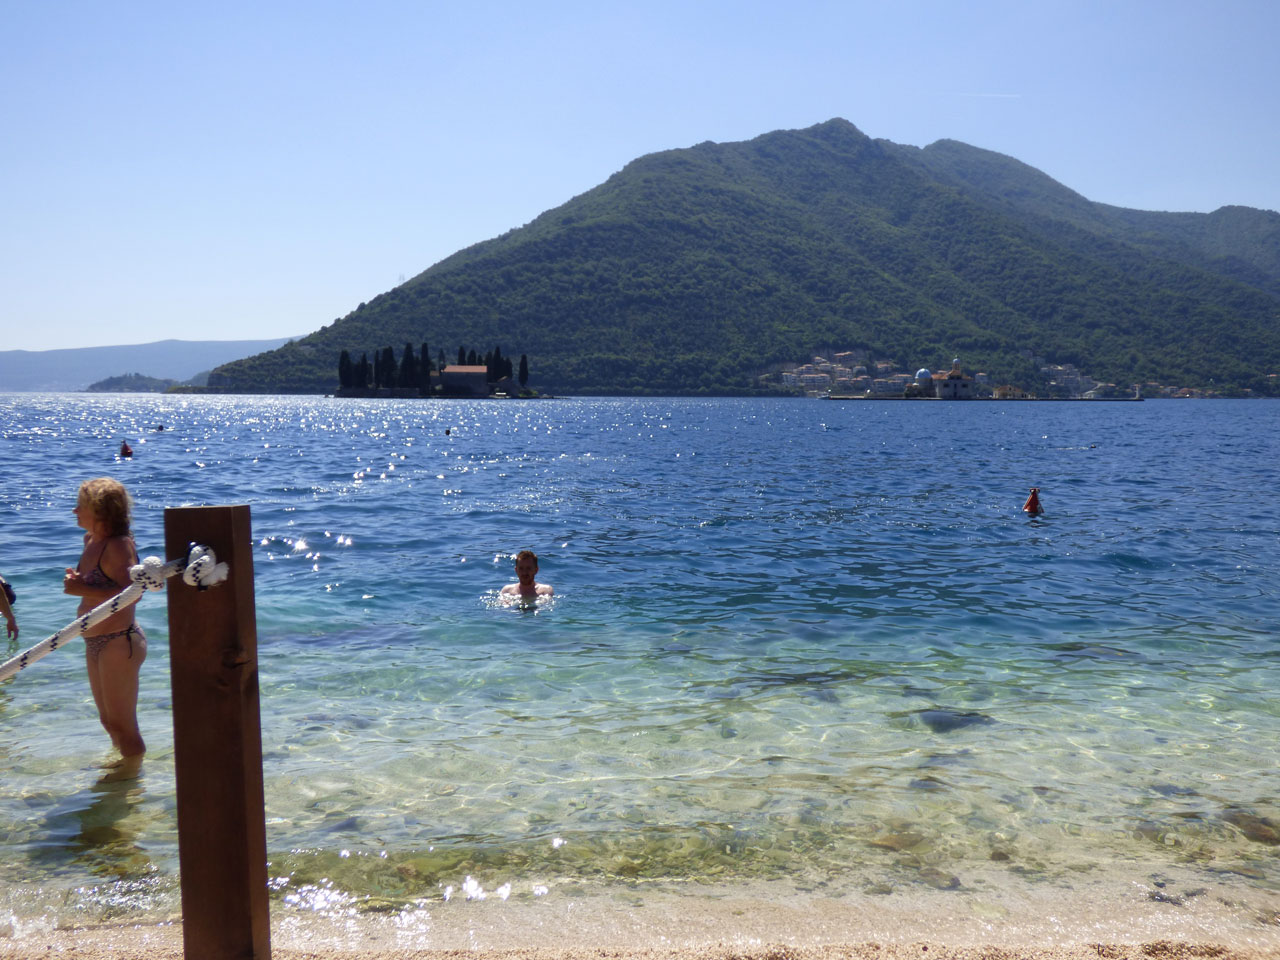 The beach at Perast, Montenegro